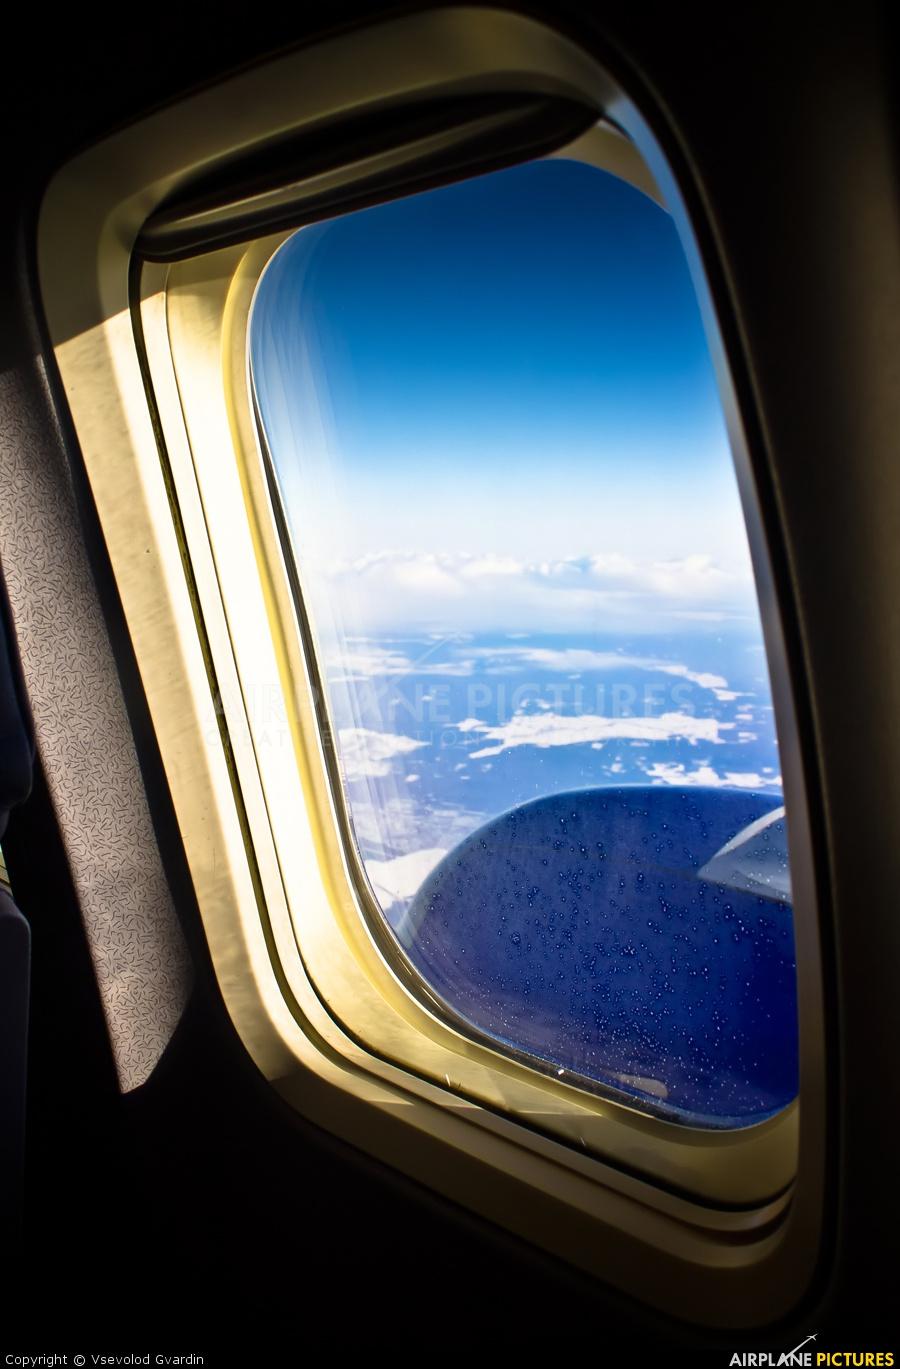 Transaero Airlines VP-BYO aircraft at In Flight - Russia